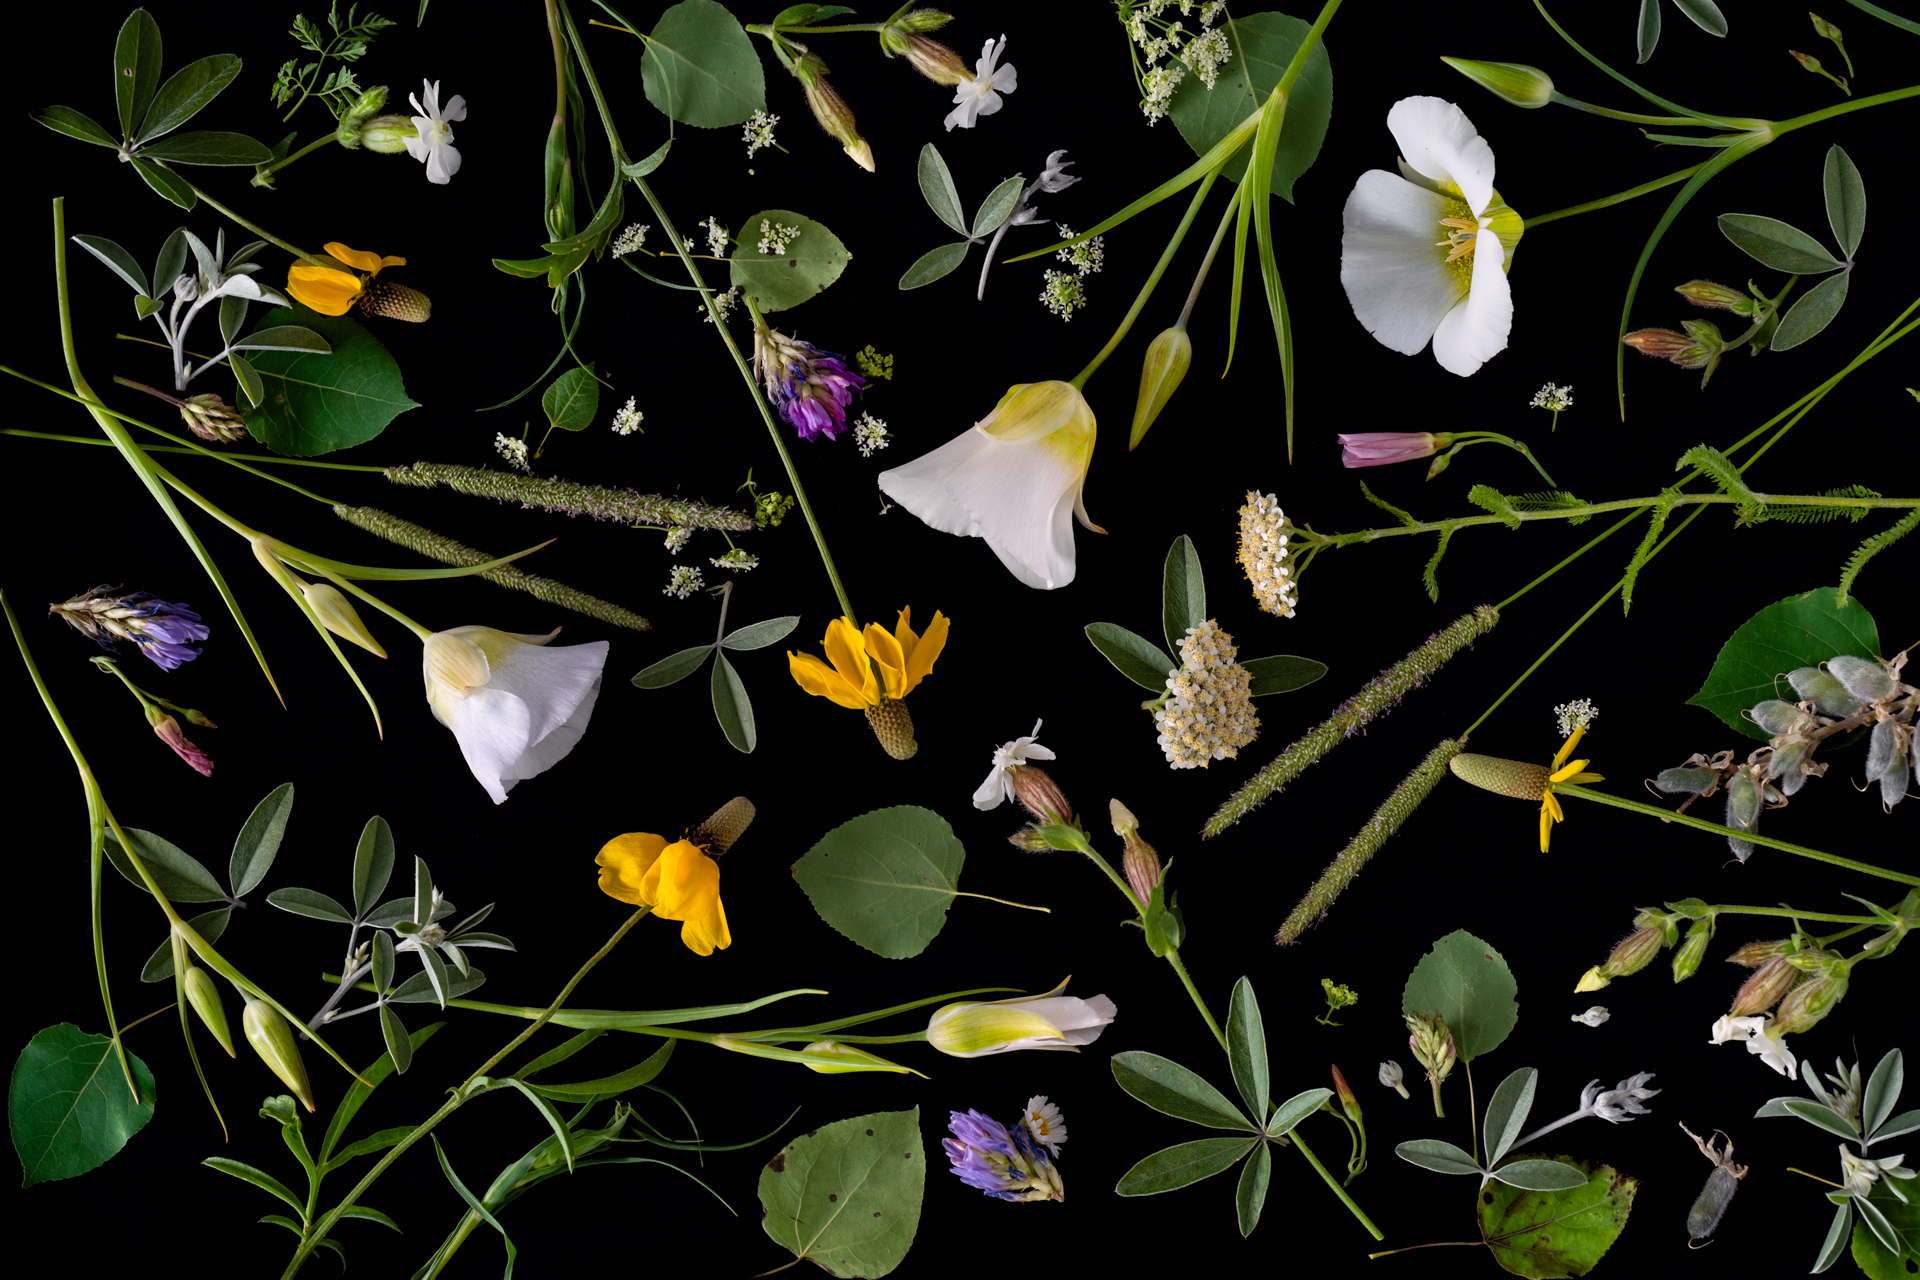 Wildflowers by Jenya Chernoff